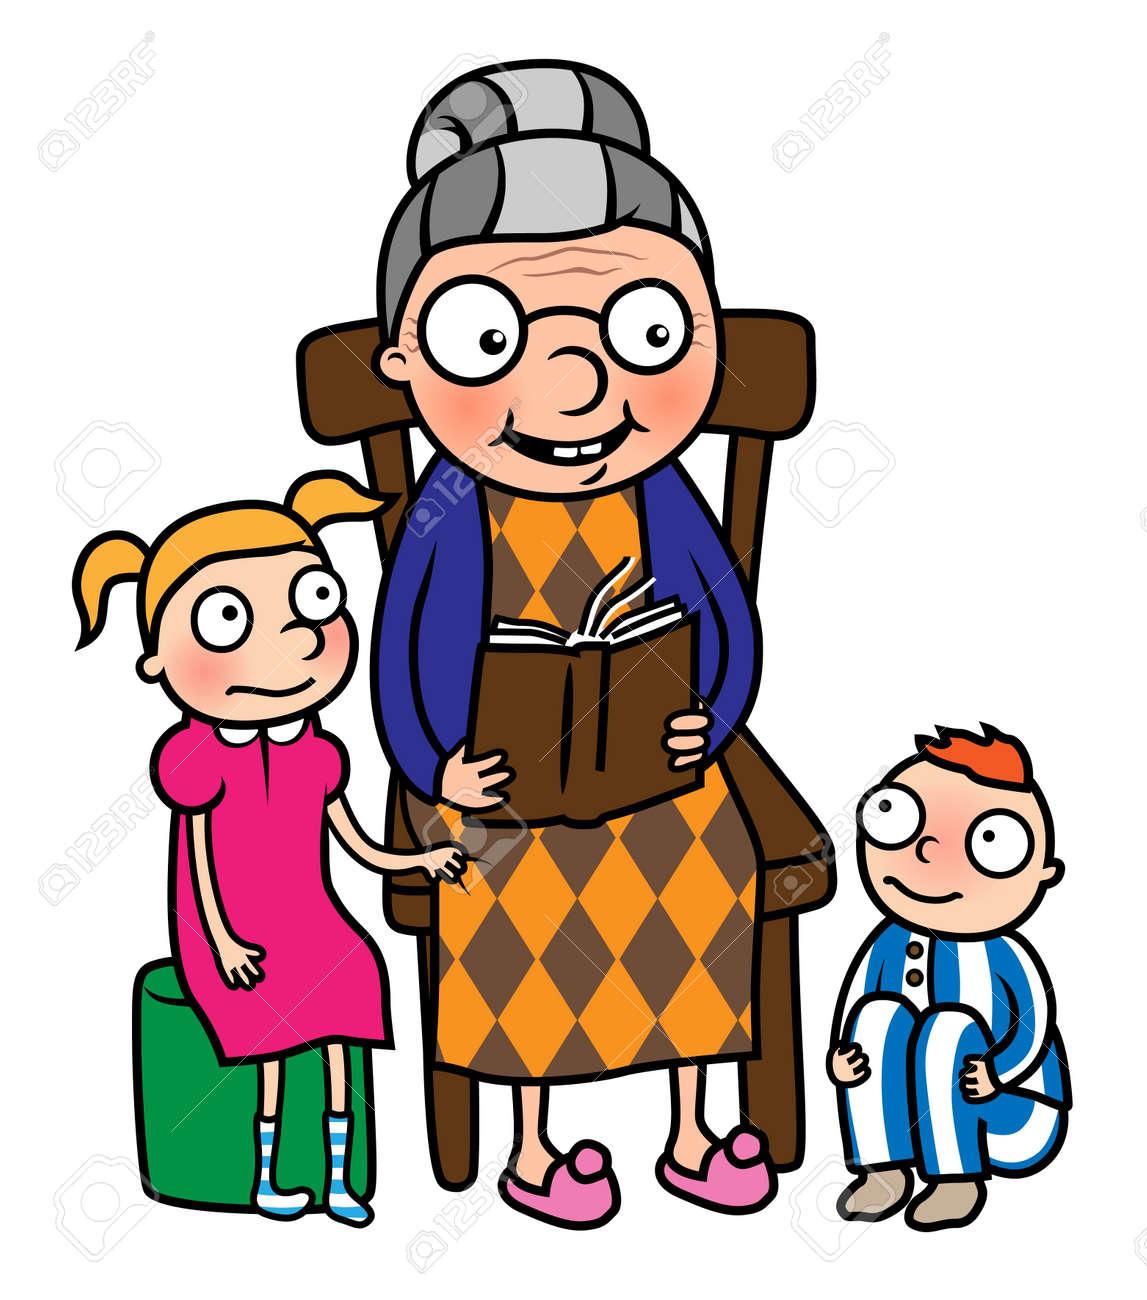 Nanny Cartoon: Cartoon Vector Illustration Of Grandmother Reading Book To  Her Grandchildren Or Nanny Reading